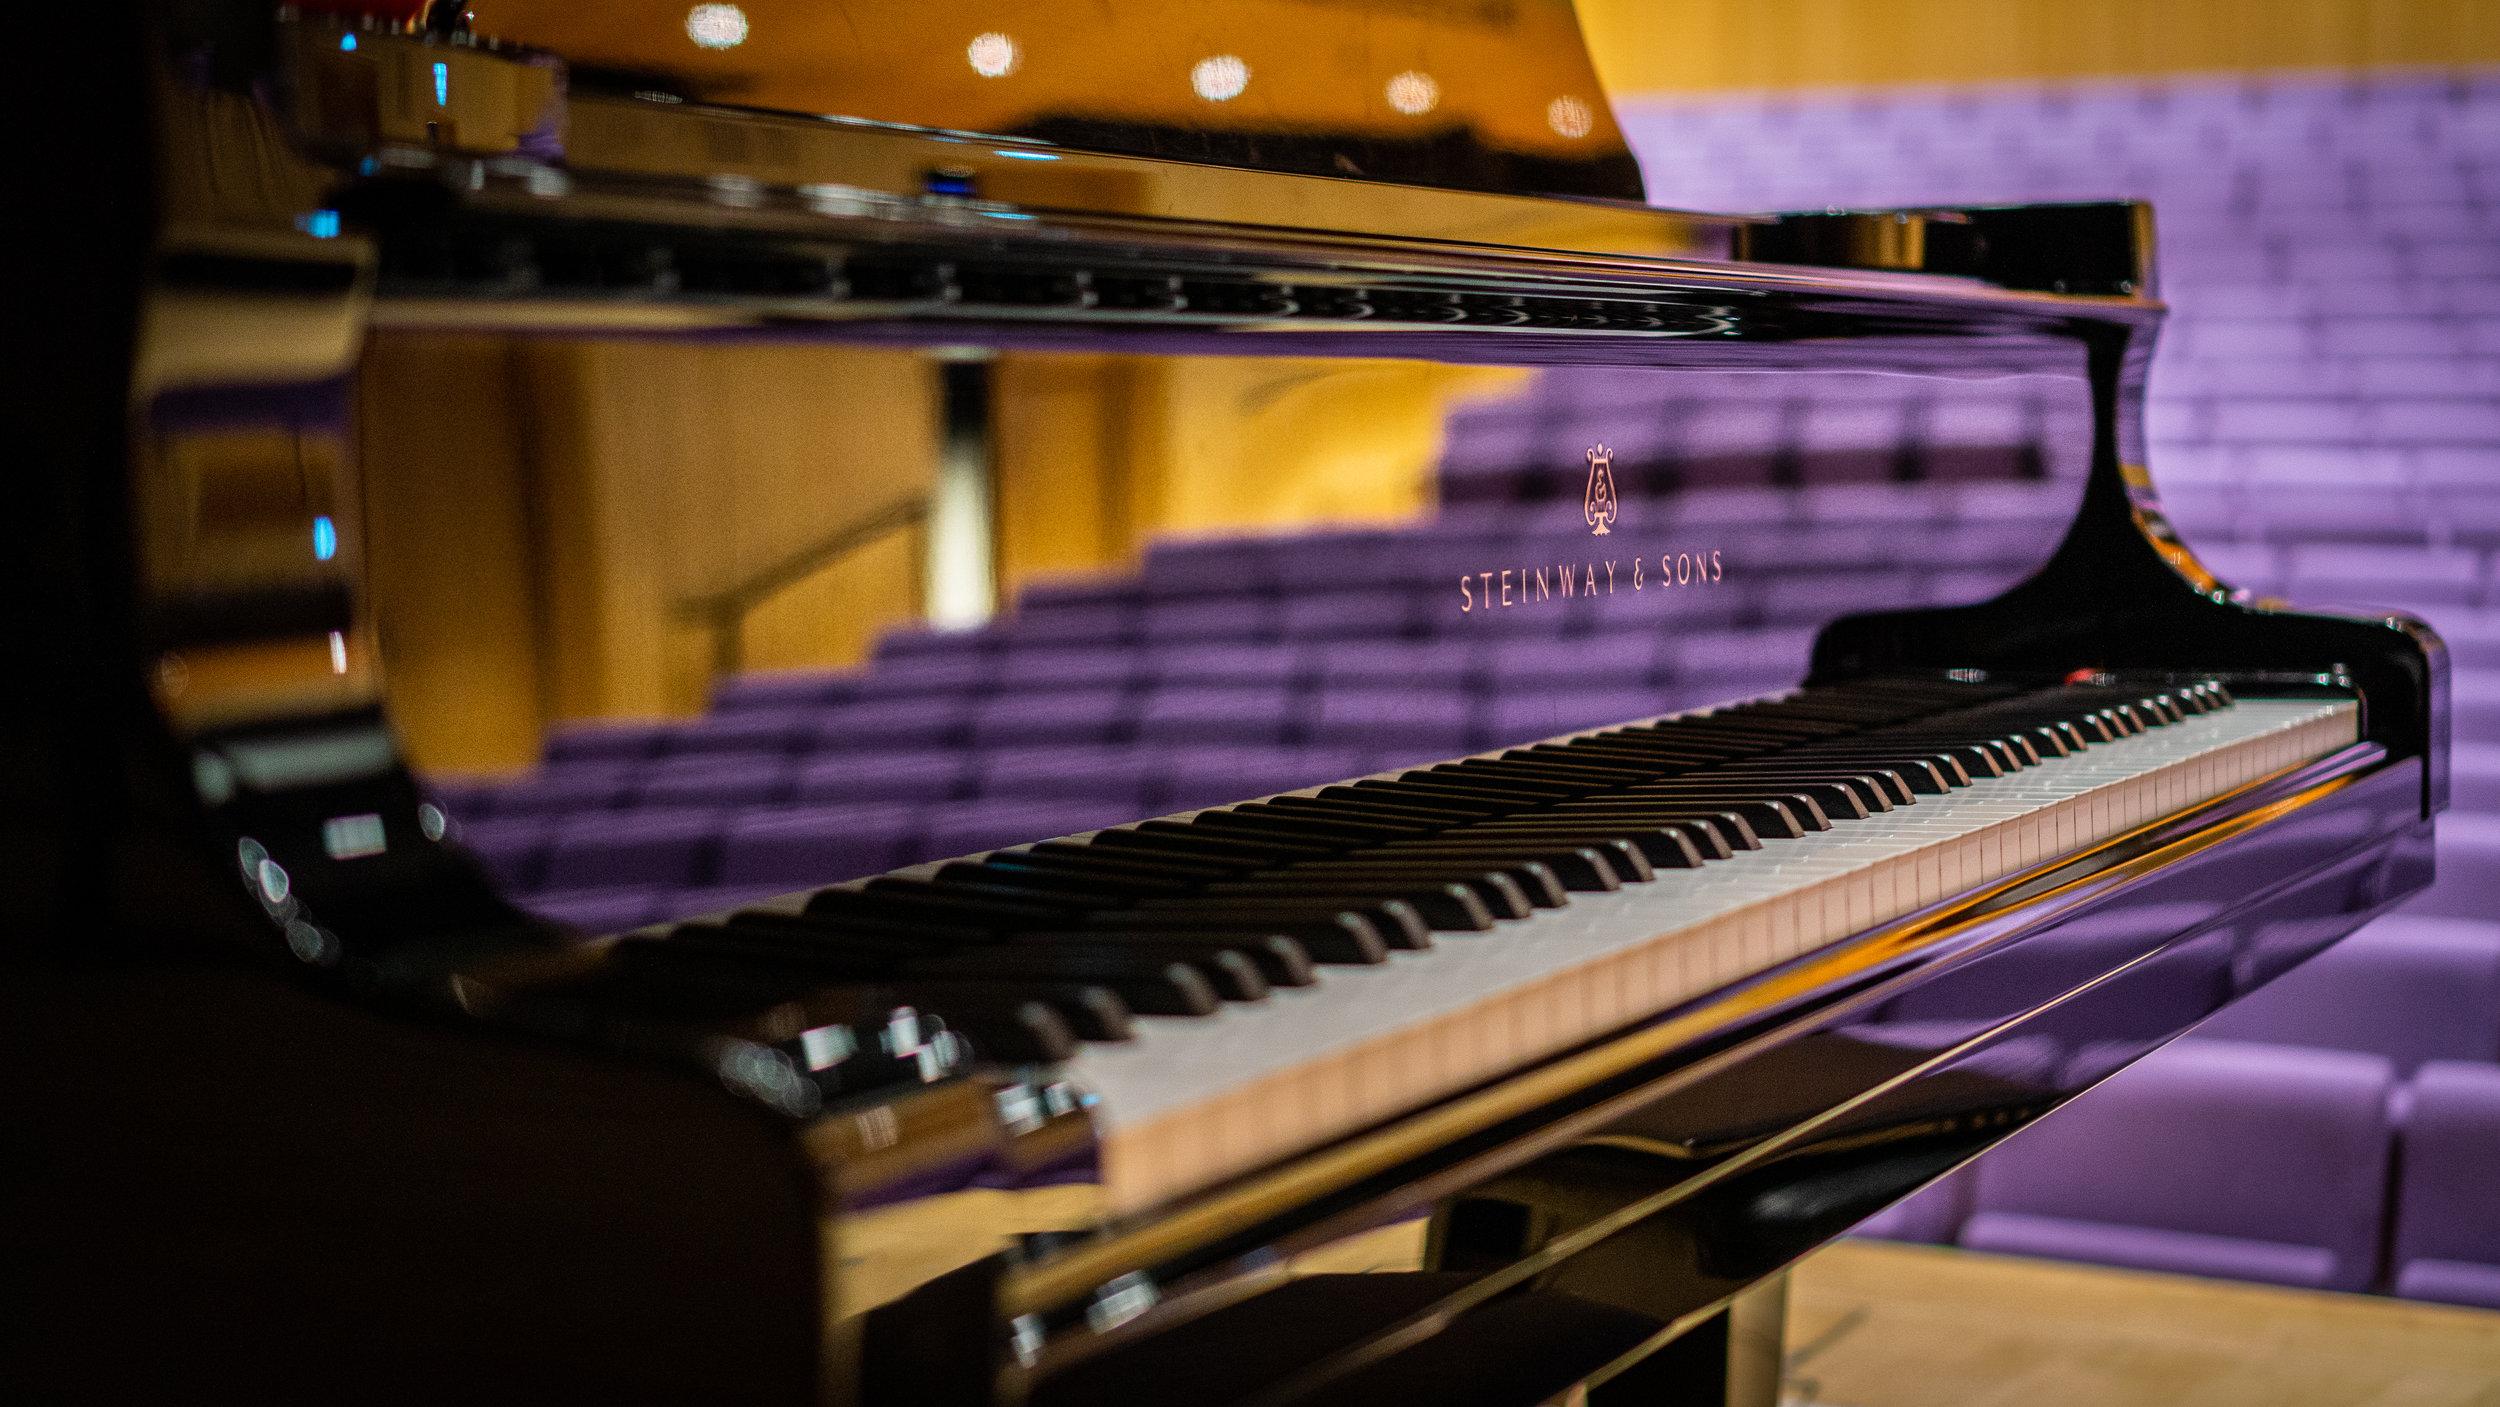 Kristiansand Concert Steinway (Pianobook) - EXS24 & Kontakt instrument PMVST003